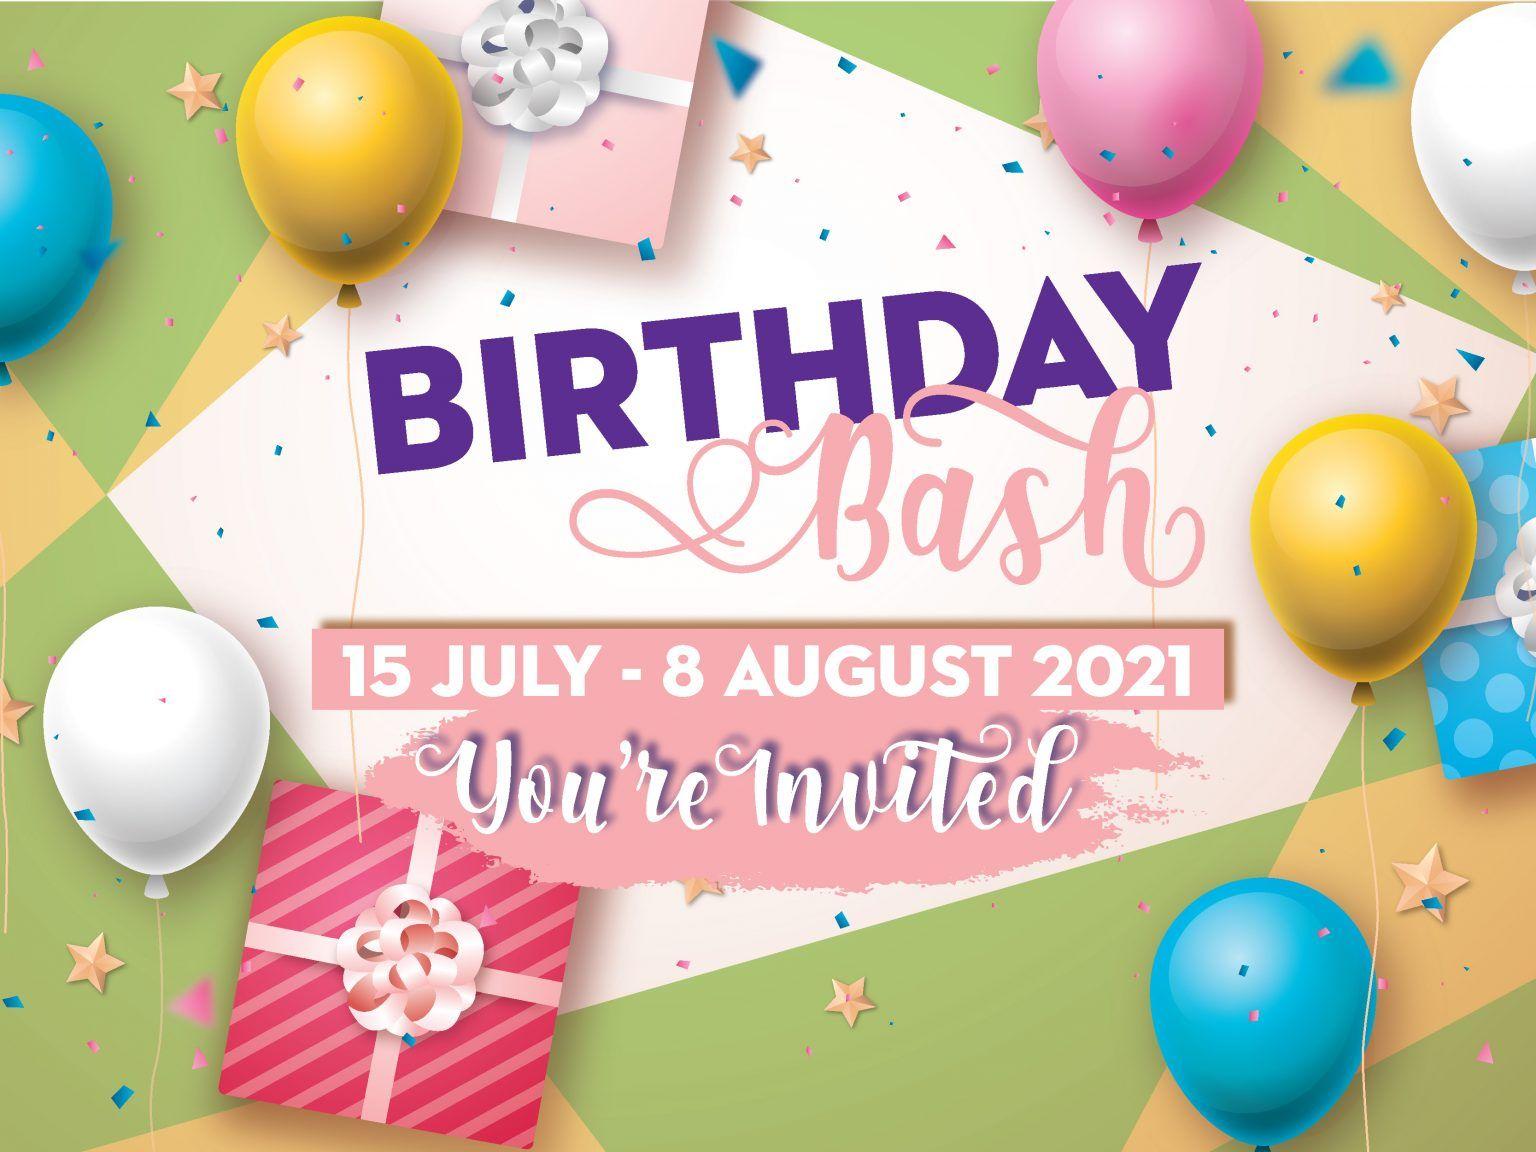 Village Grocer's Birthday Bash